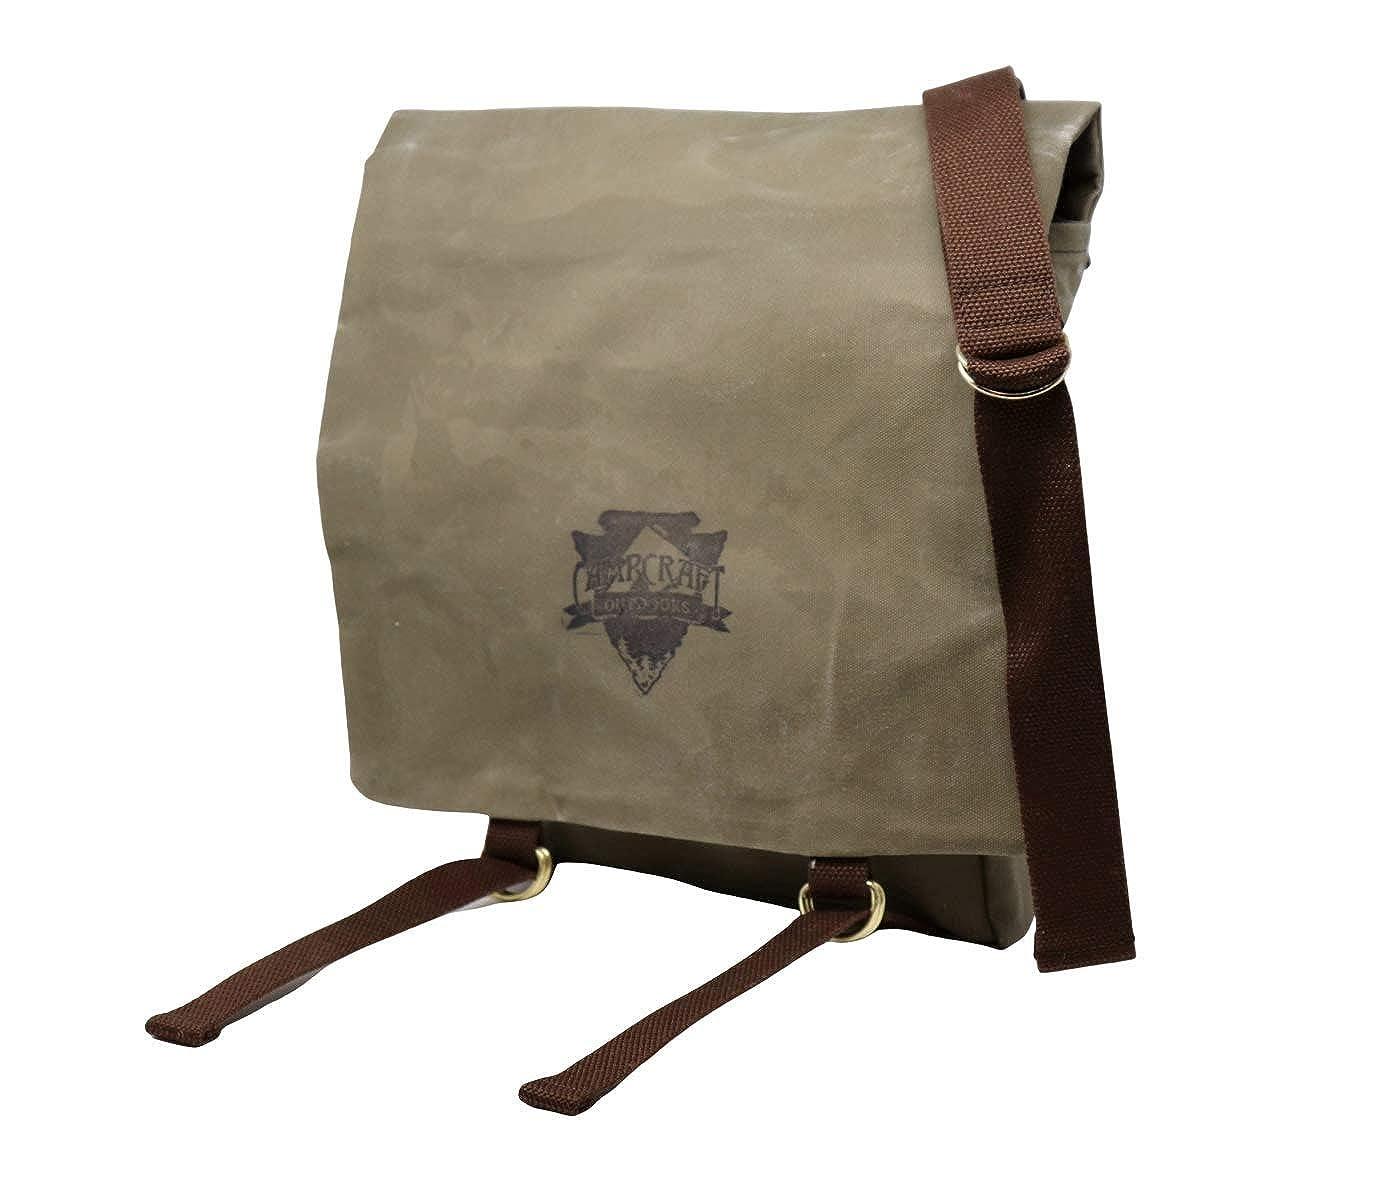 Woodcraft Haversack, Bushcraft Bag, Waxed Canvas Bag, Outdoor Bag